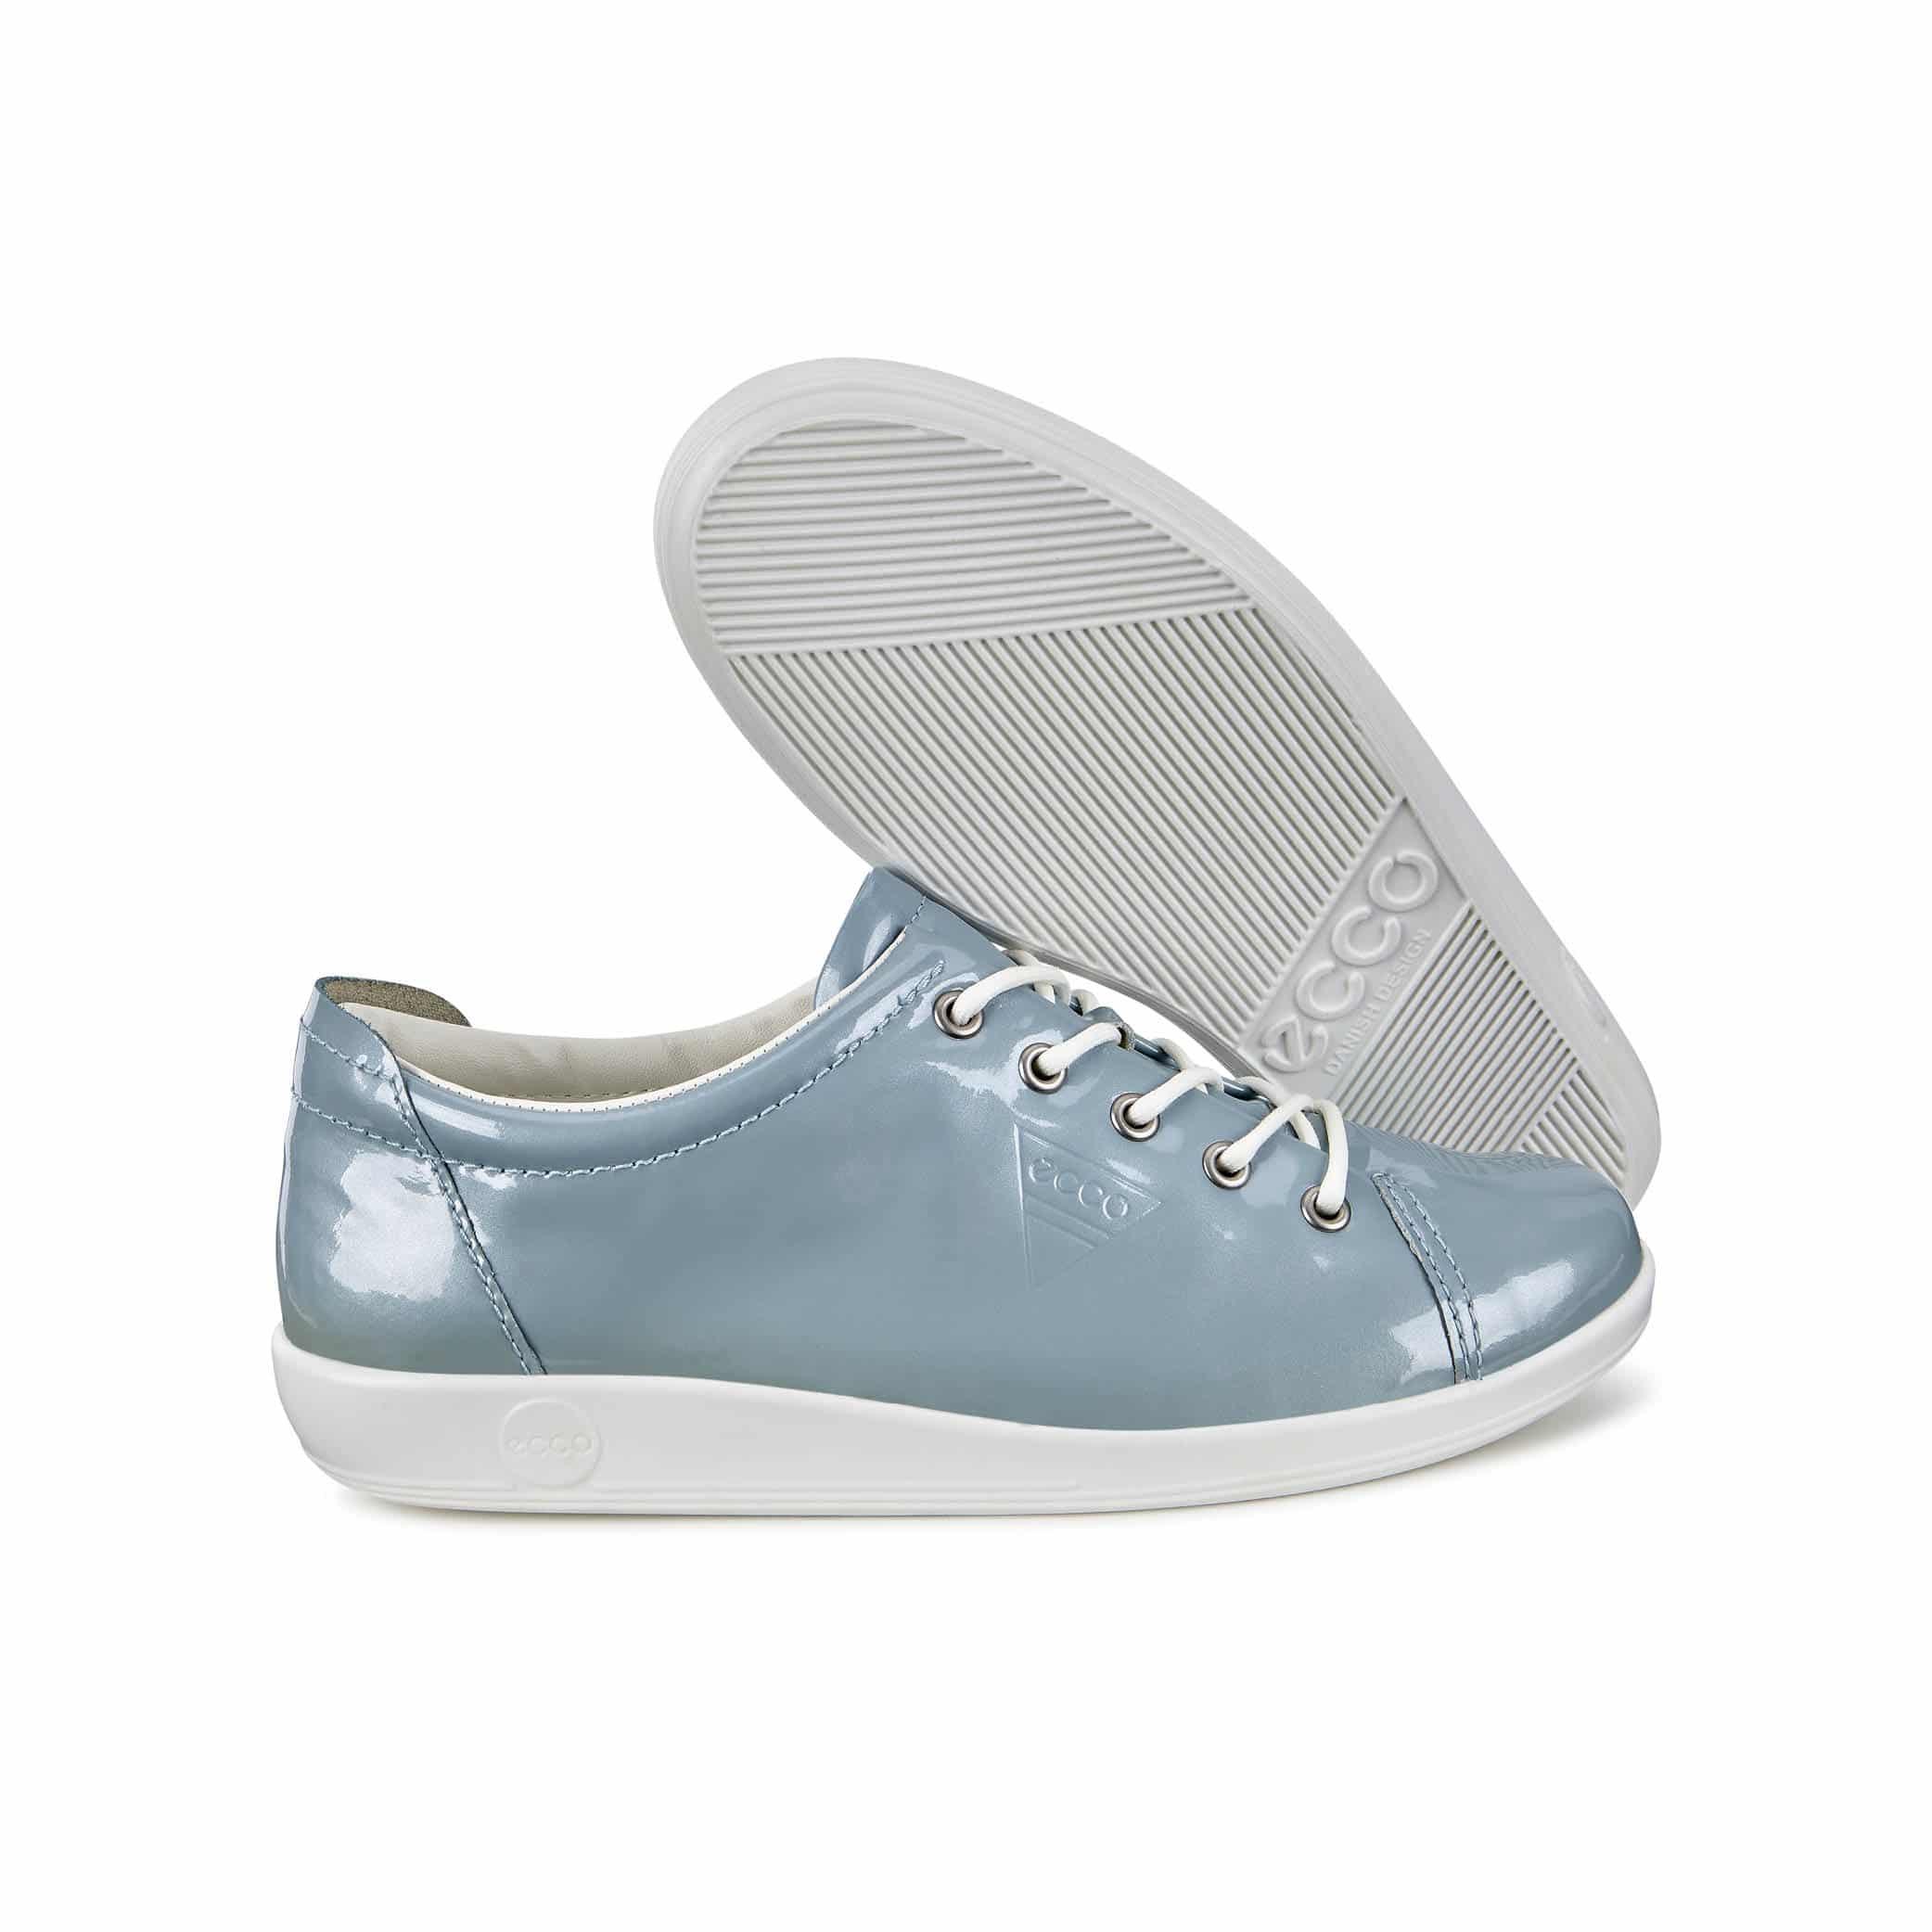 593d2f0eb415 ECCO SOFT 2.0 - ECCO Shoes for Men